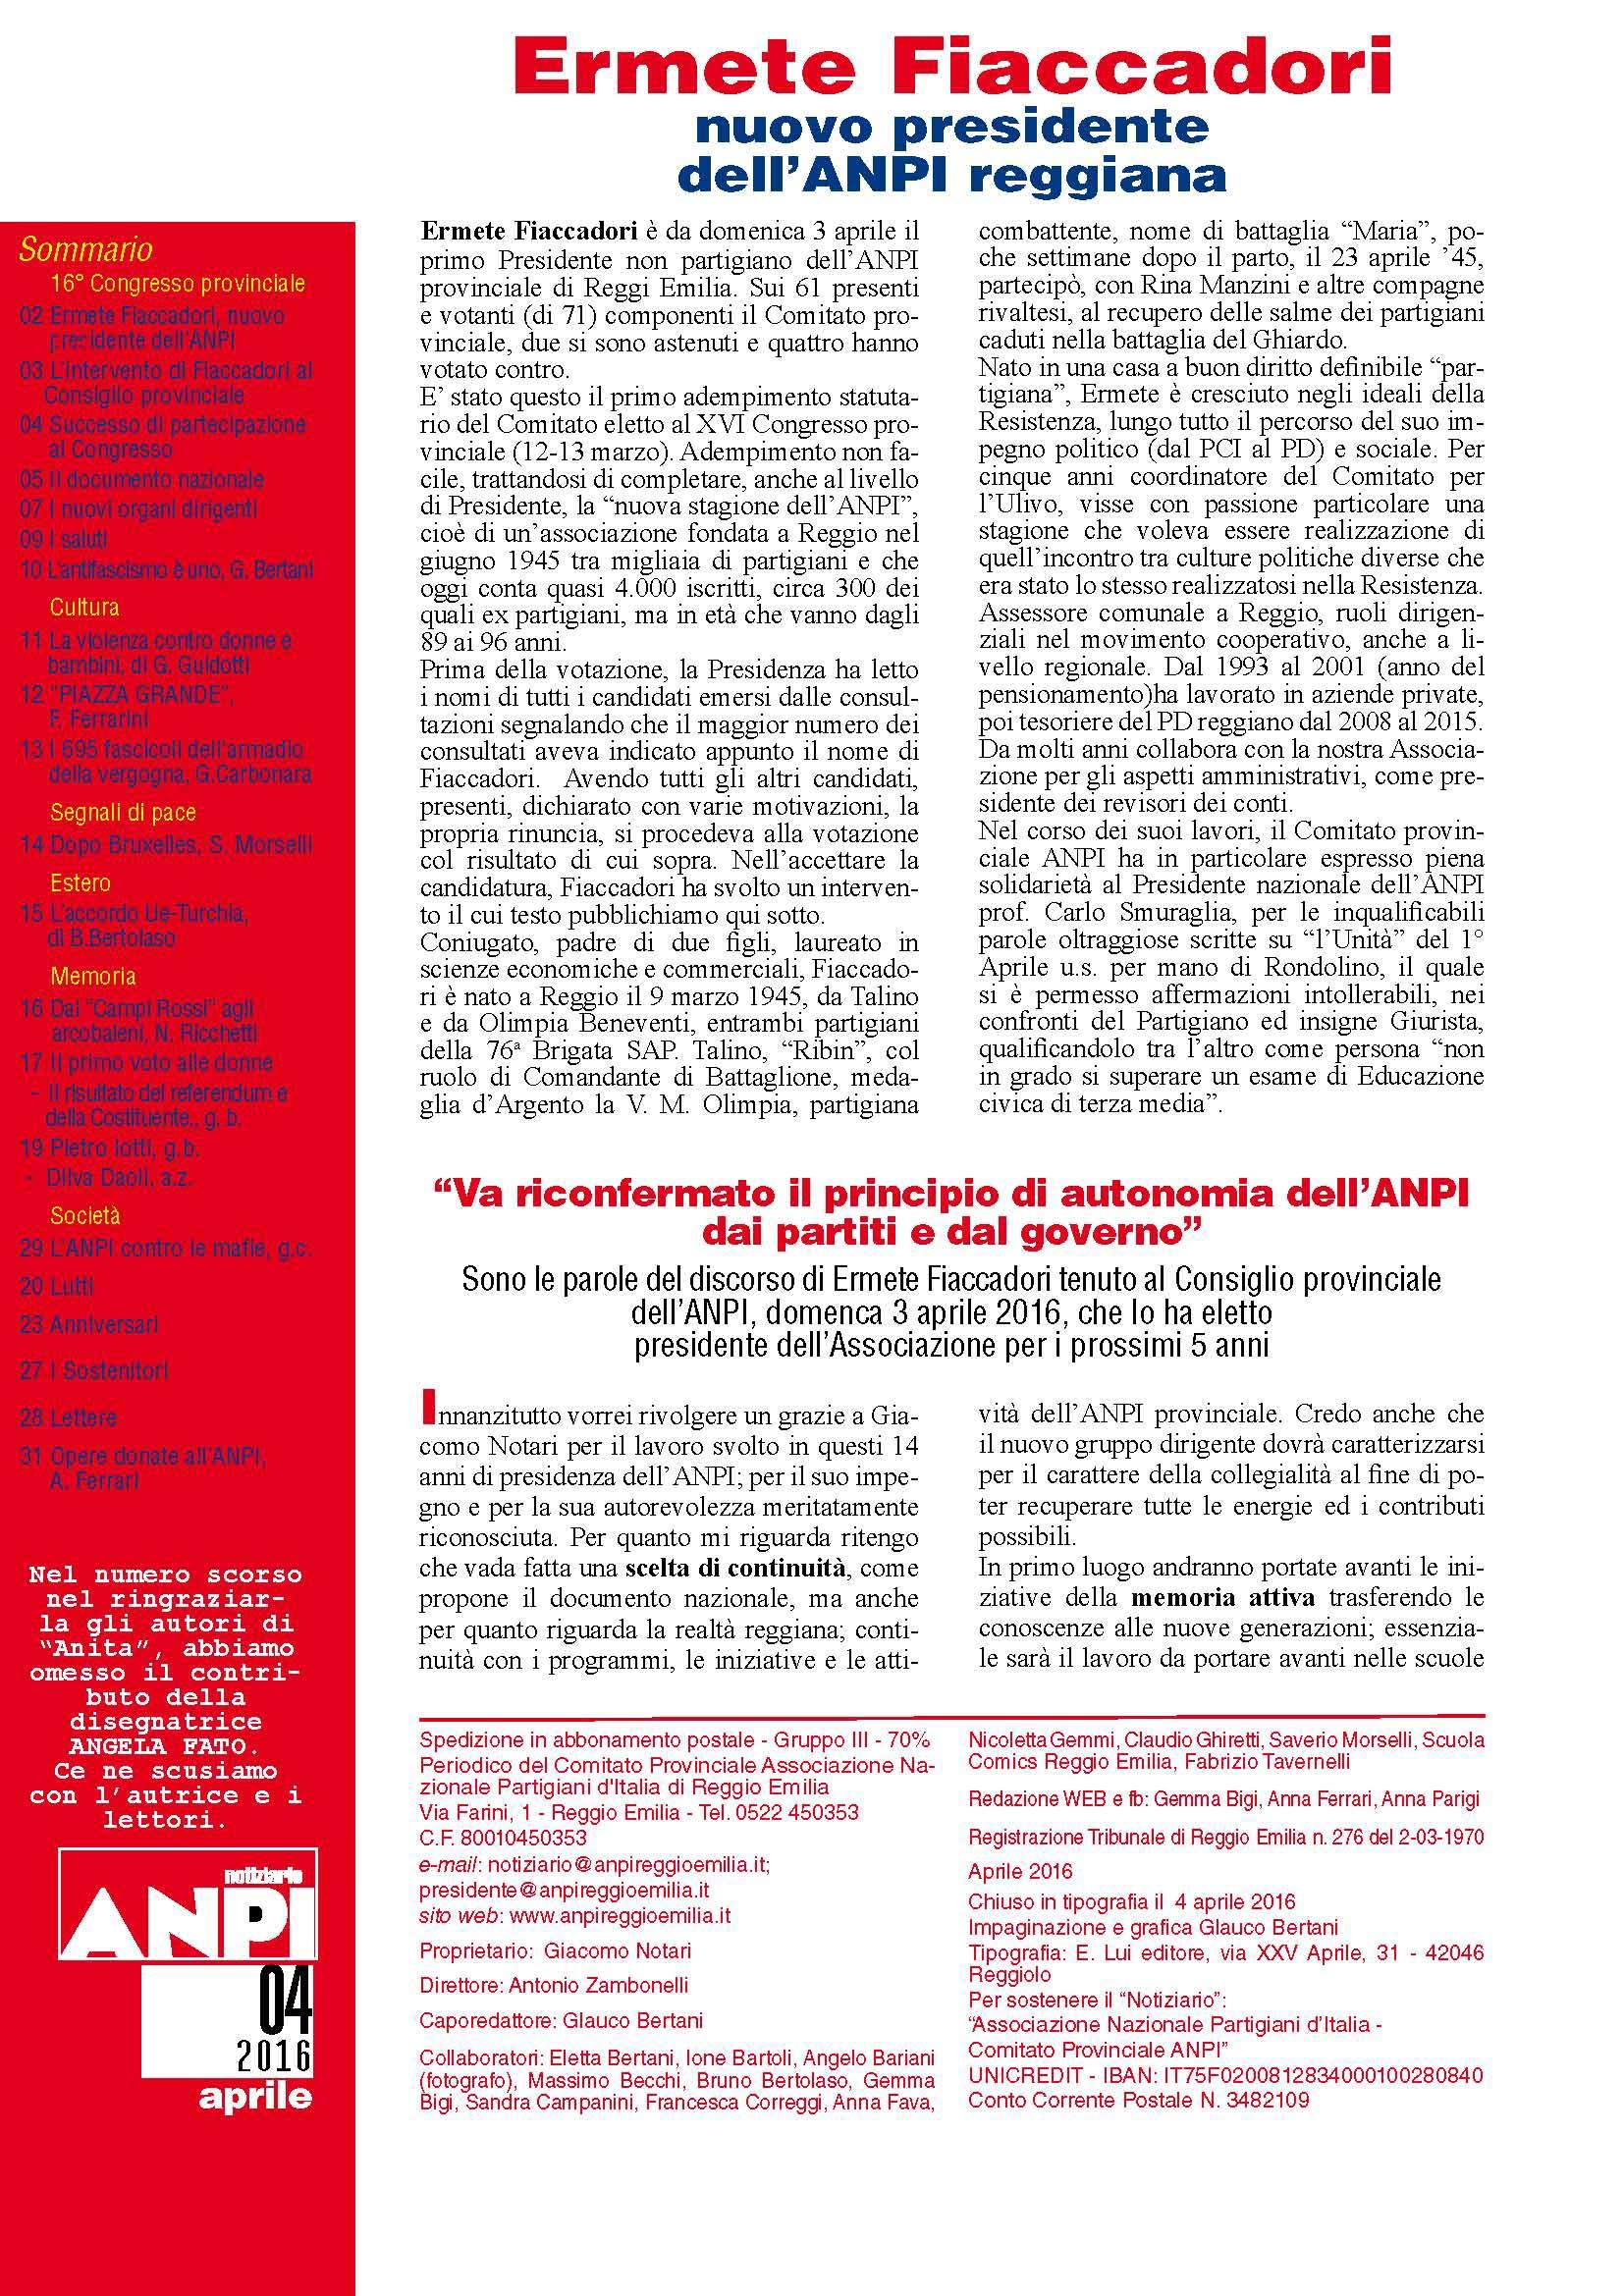 Pag-Notiziario-Aprile-2016-web-2